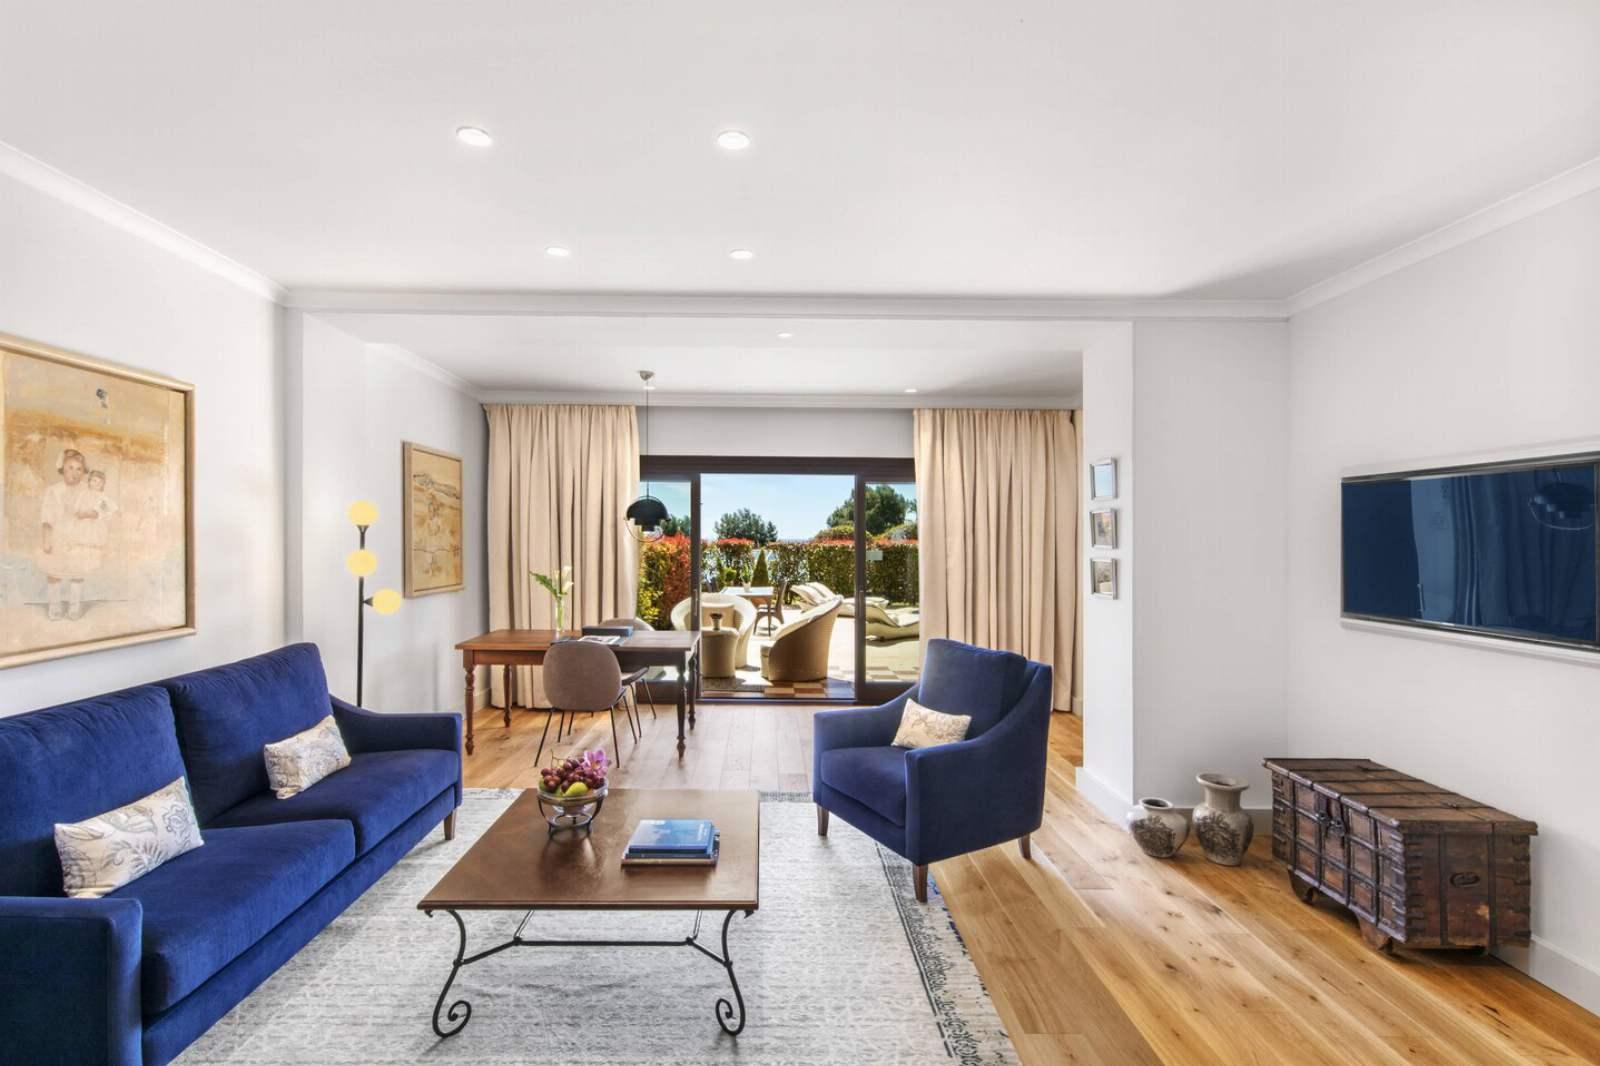 St. Regis Mardavall Resort - Blue Oasis Suite